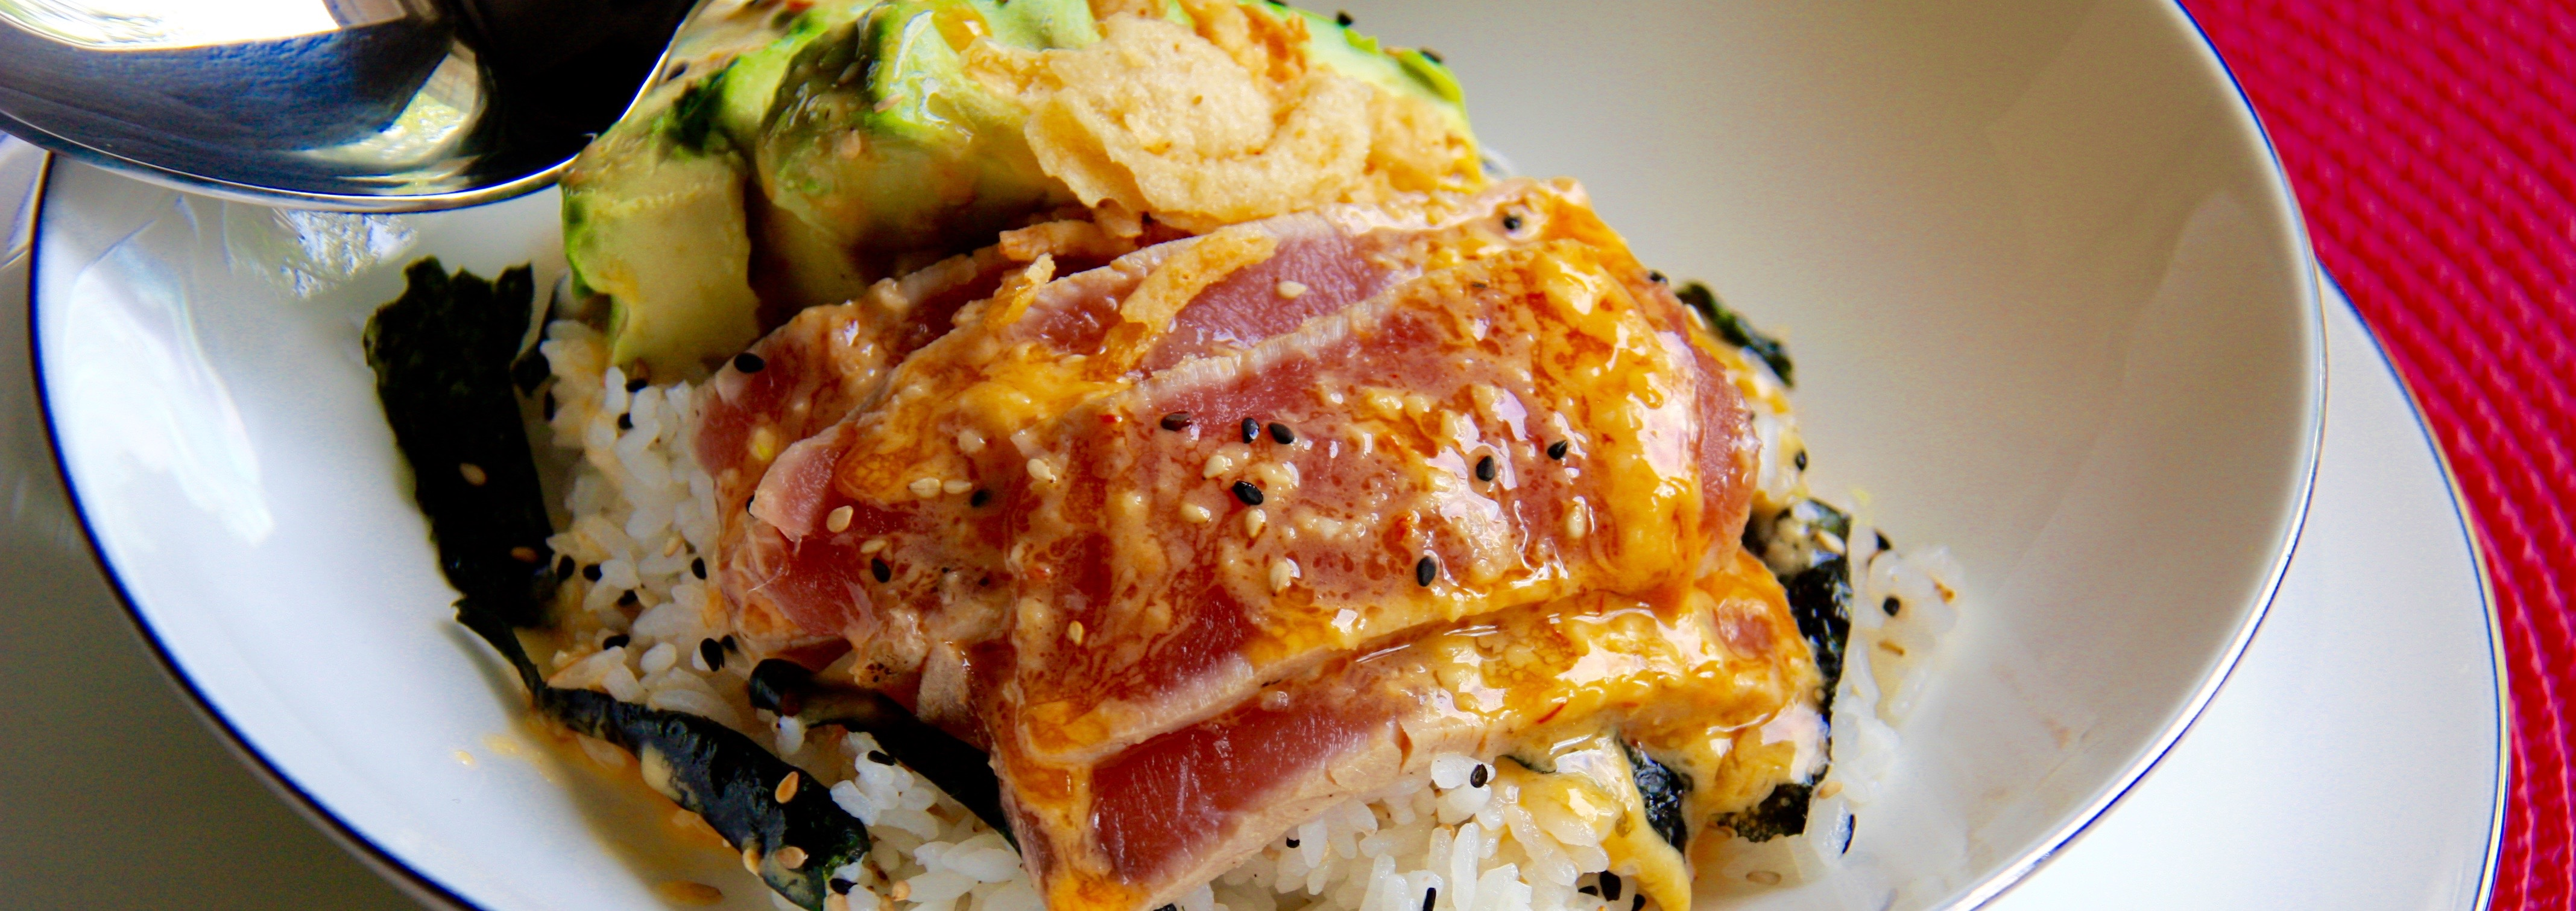 Sushi Bowls